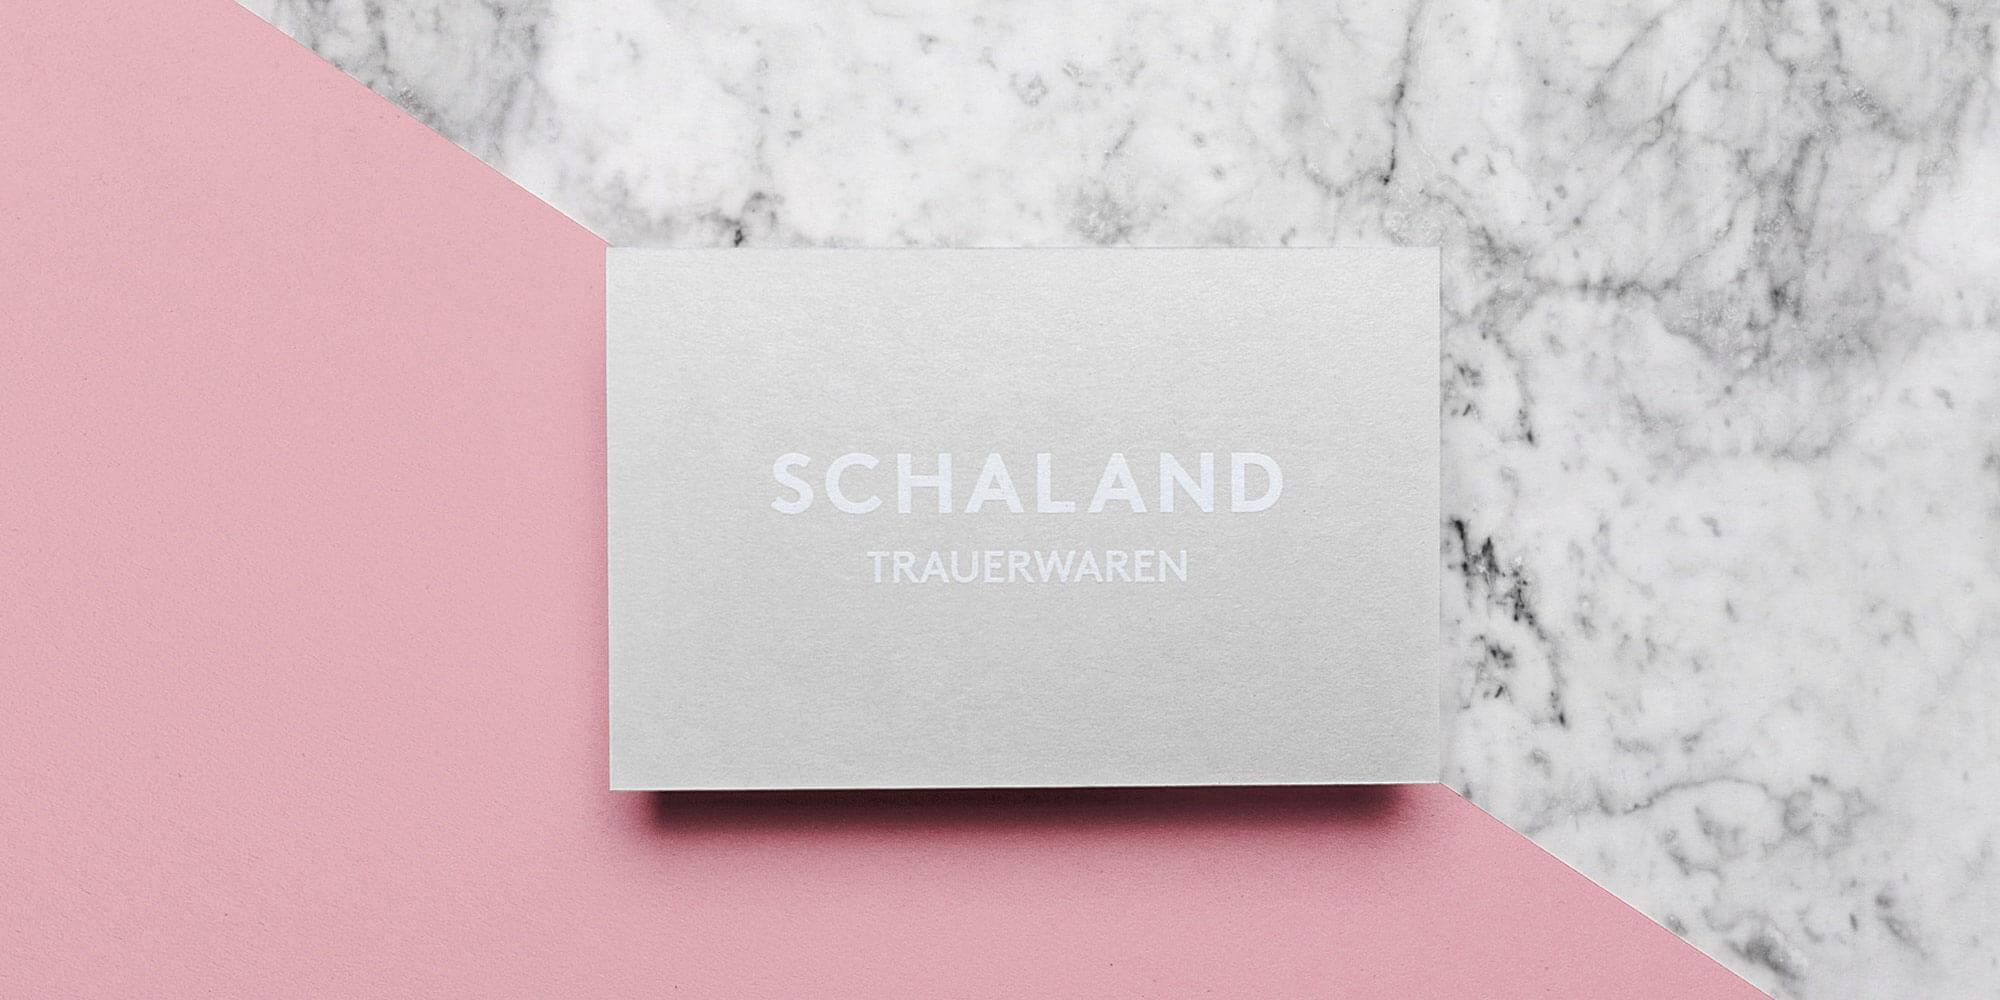 Schaland